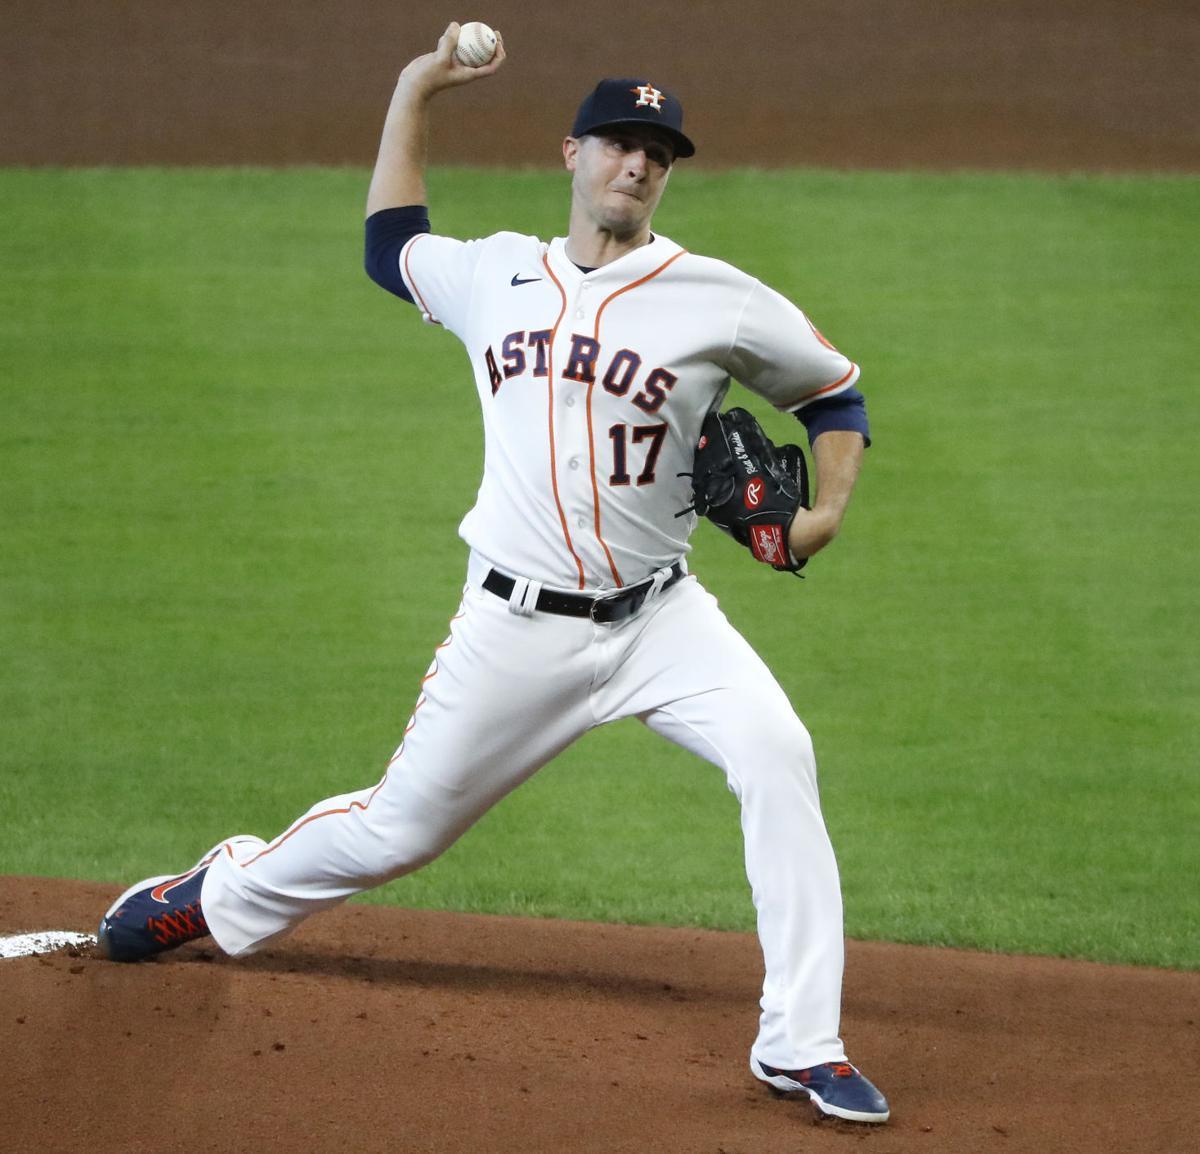 Houston Astros vs. San Diego Padres